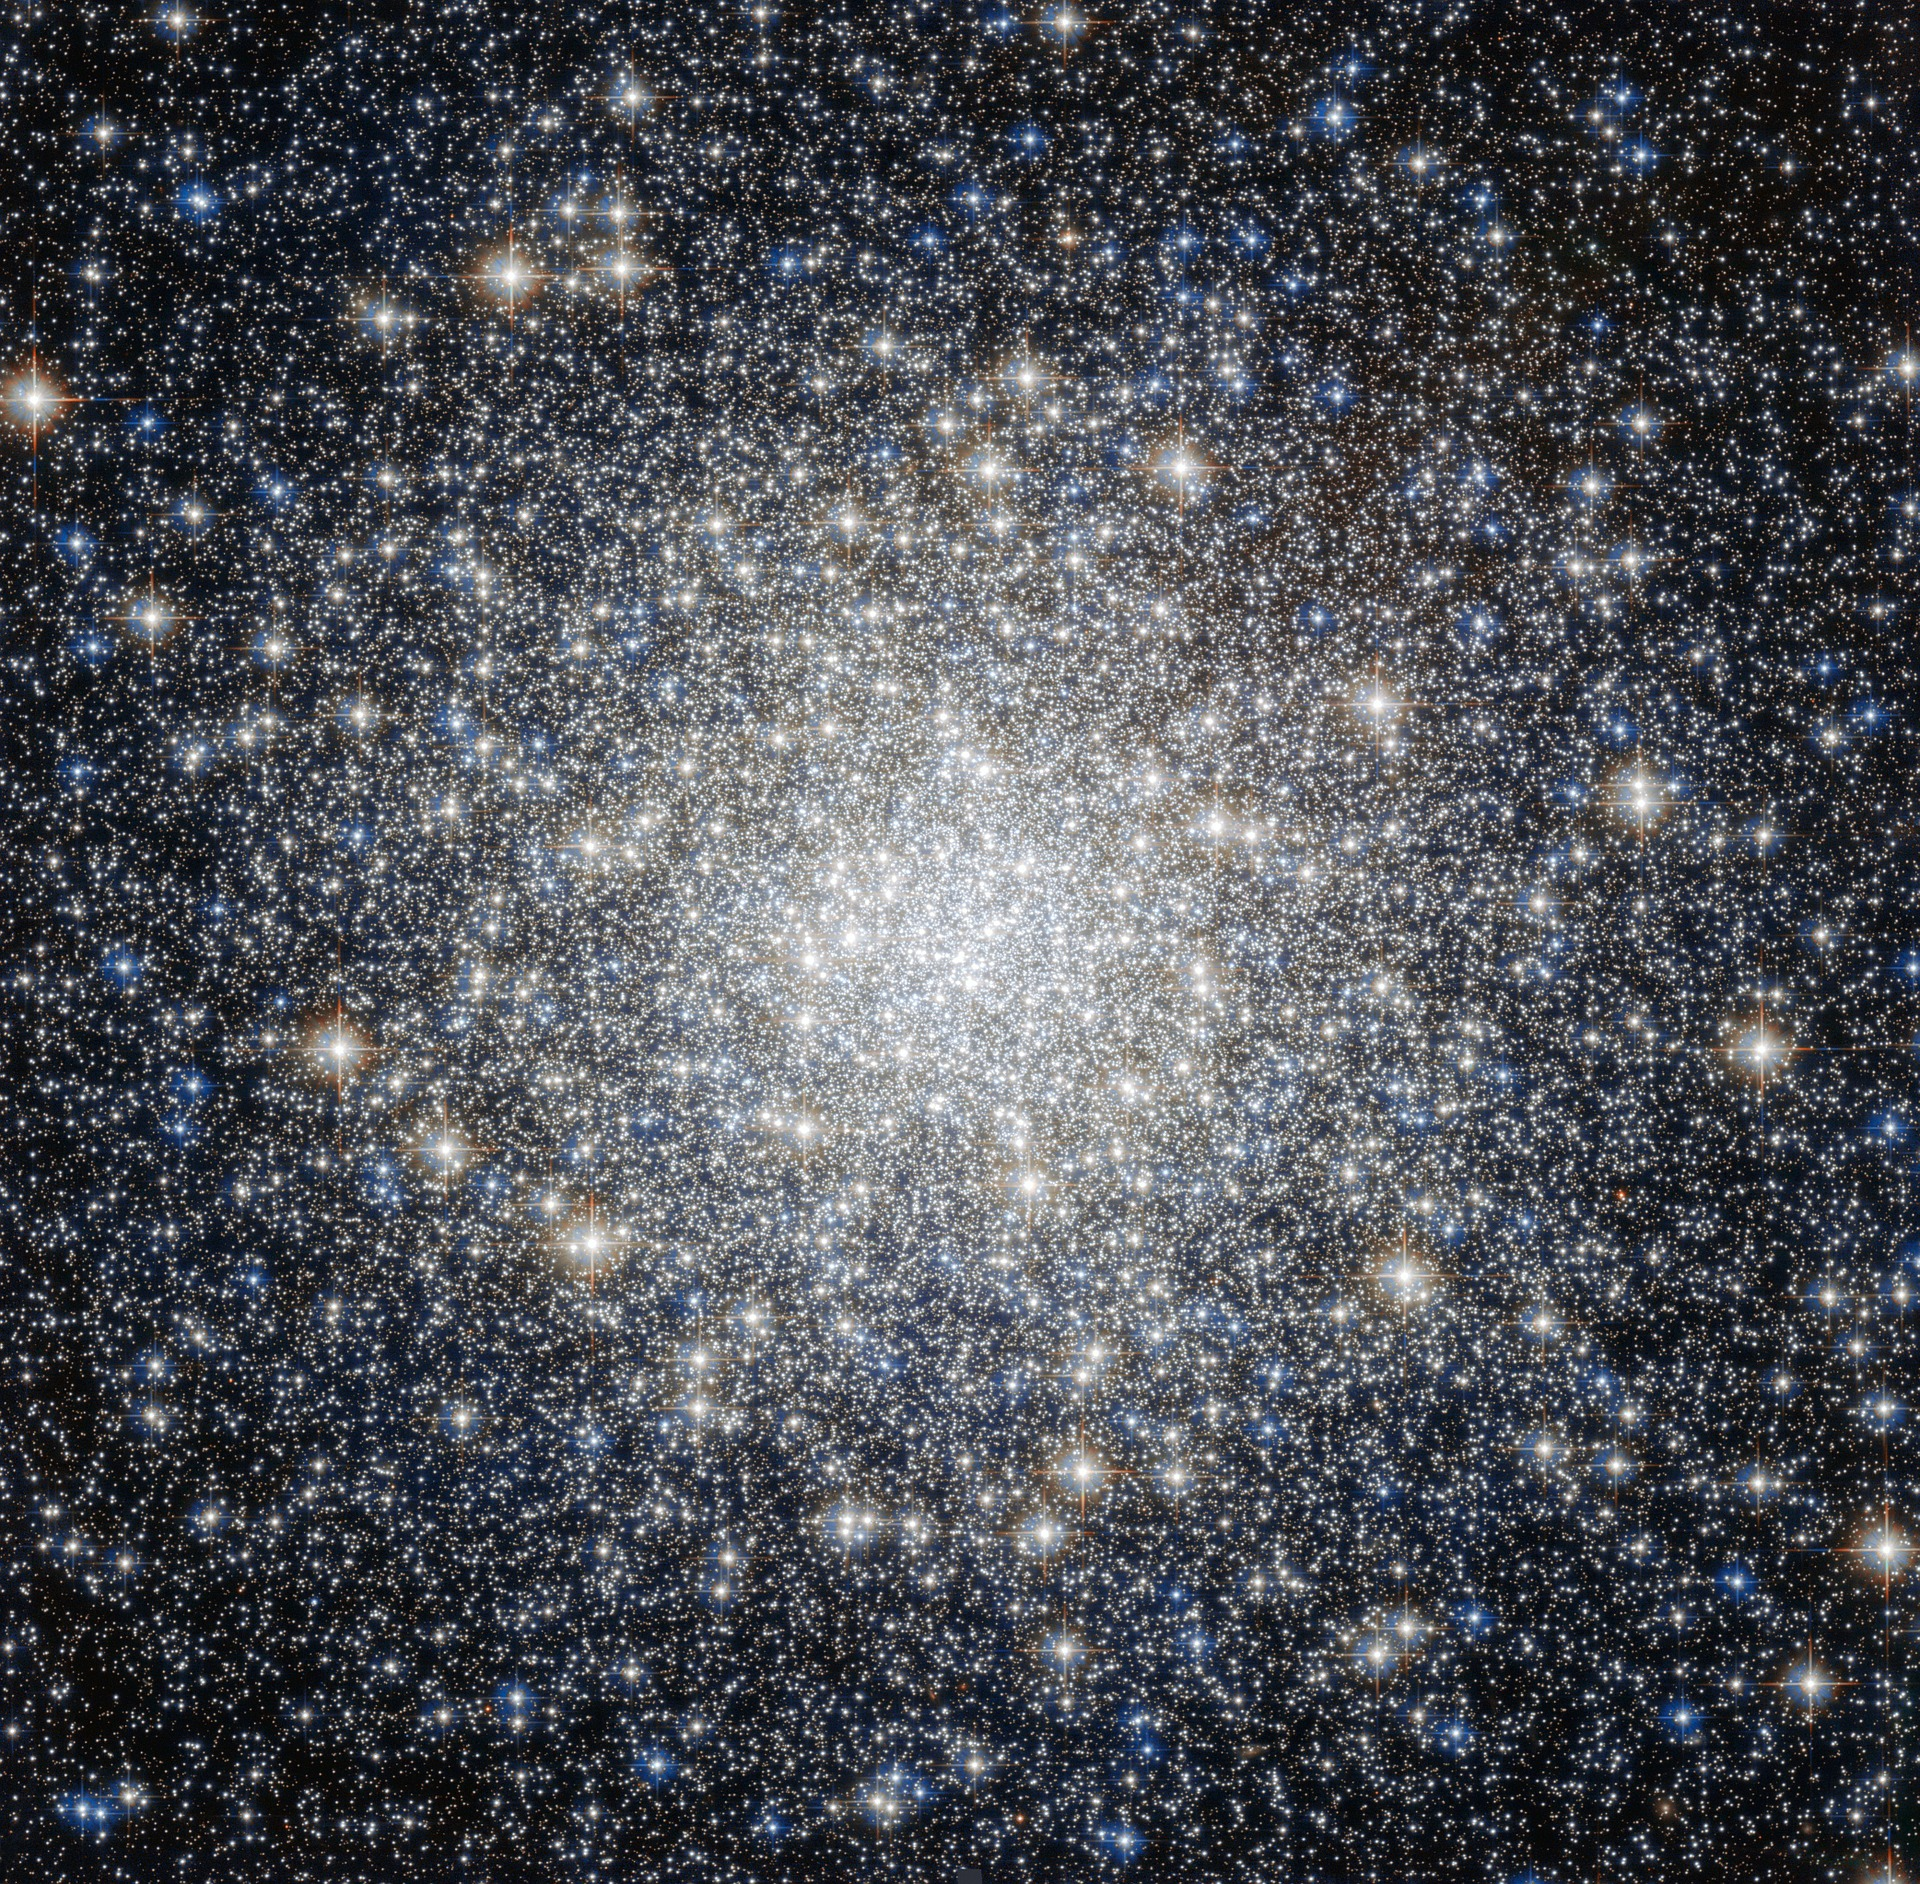 globular-cluster-597899_1920.jpg